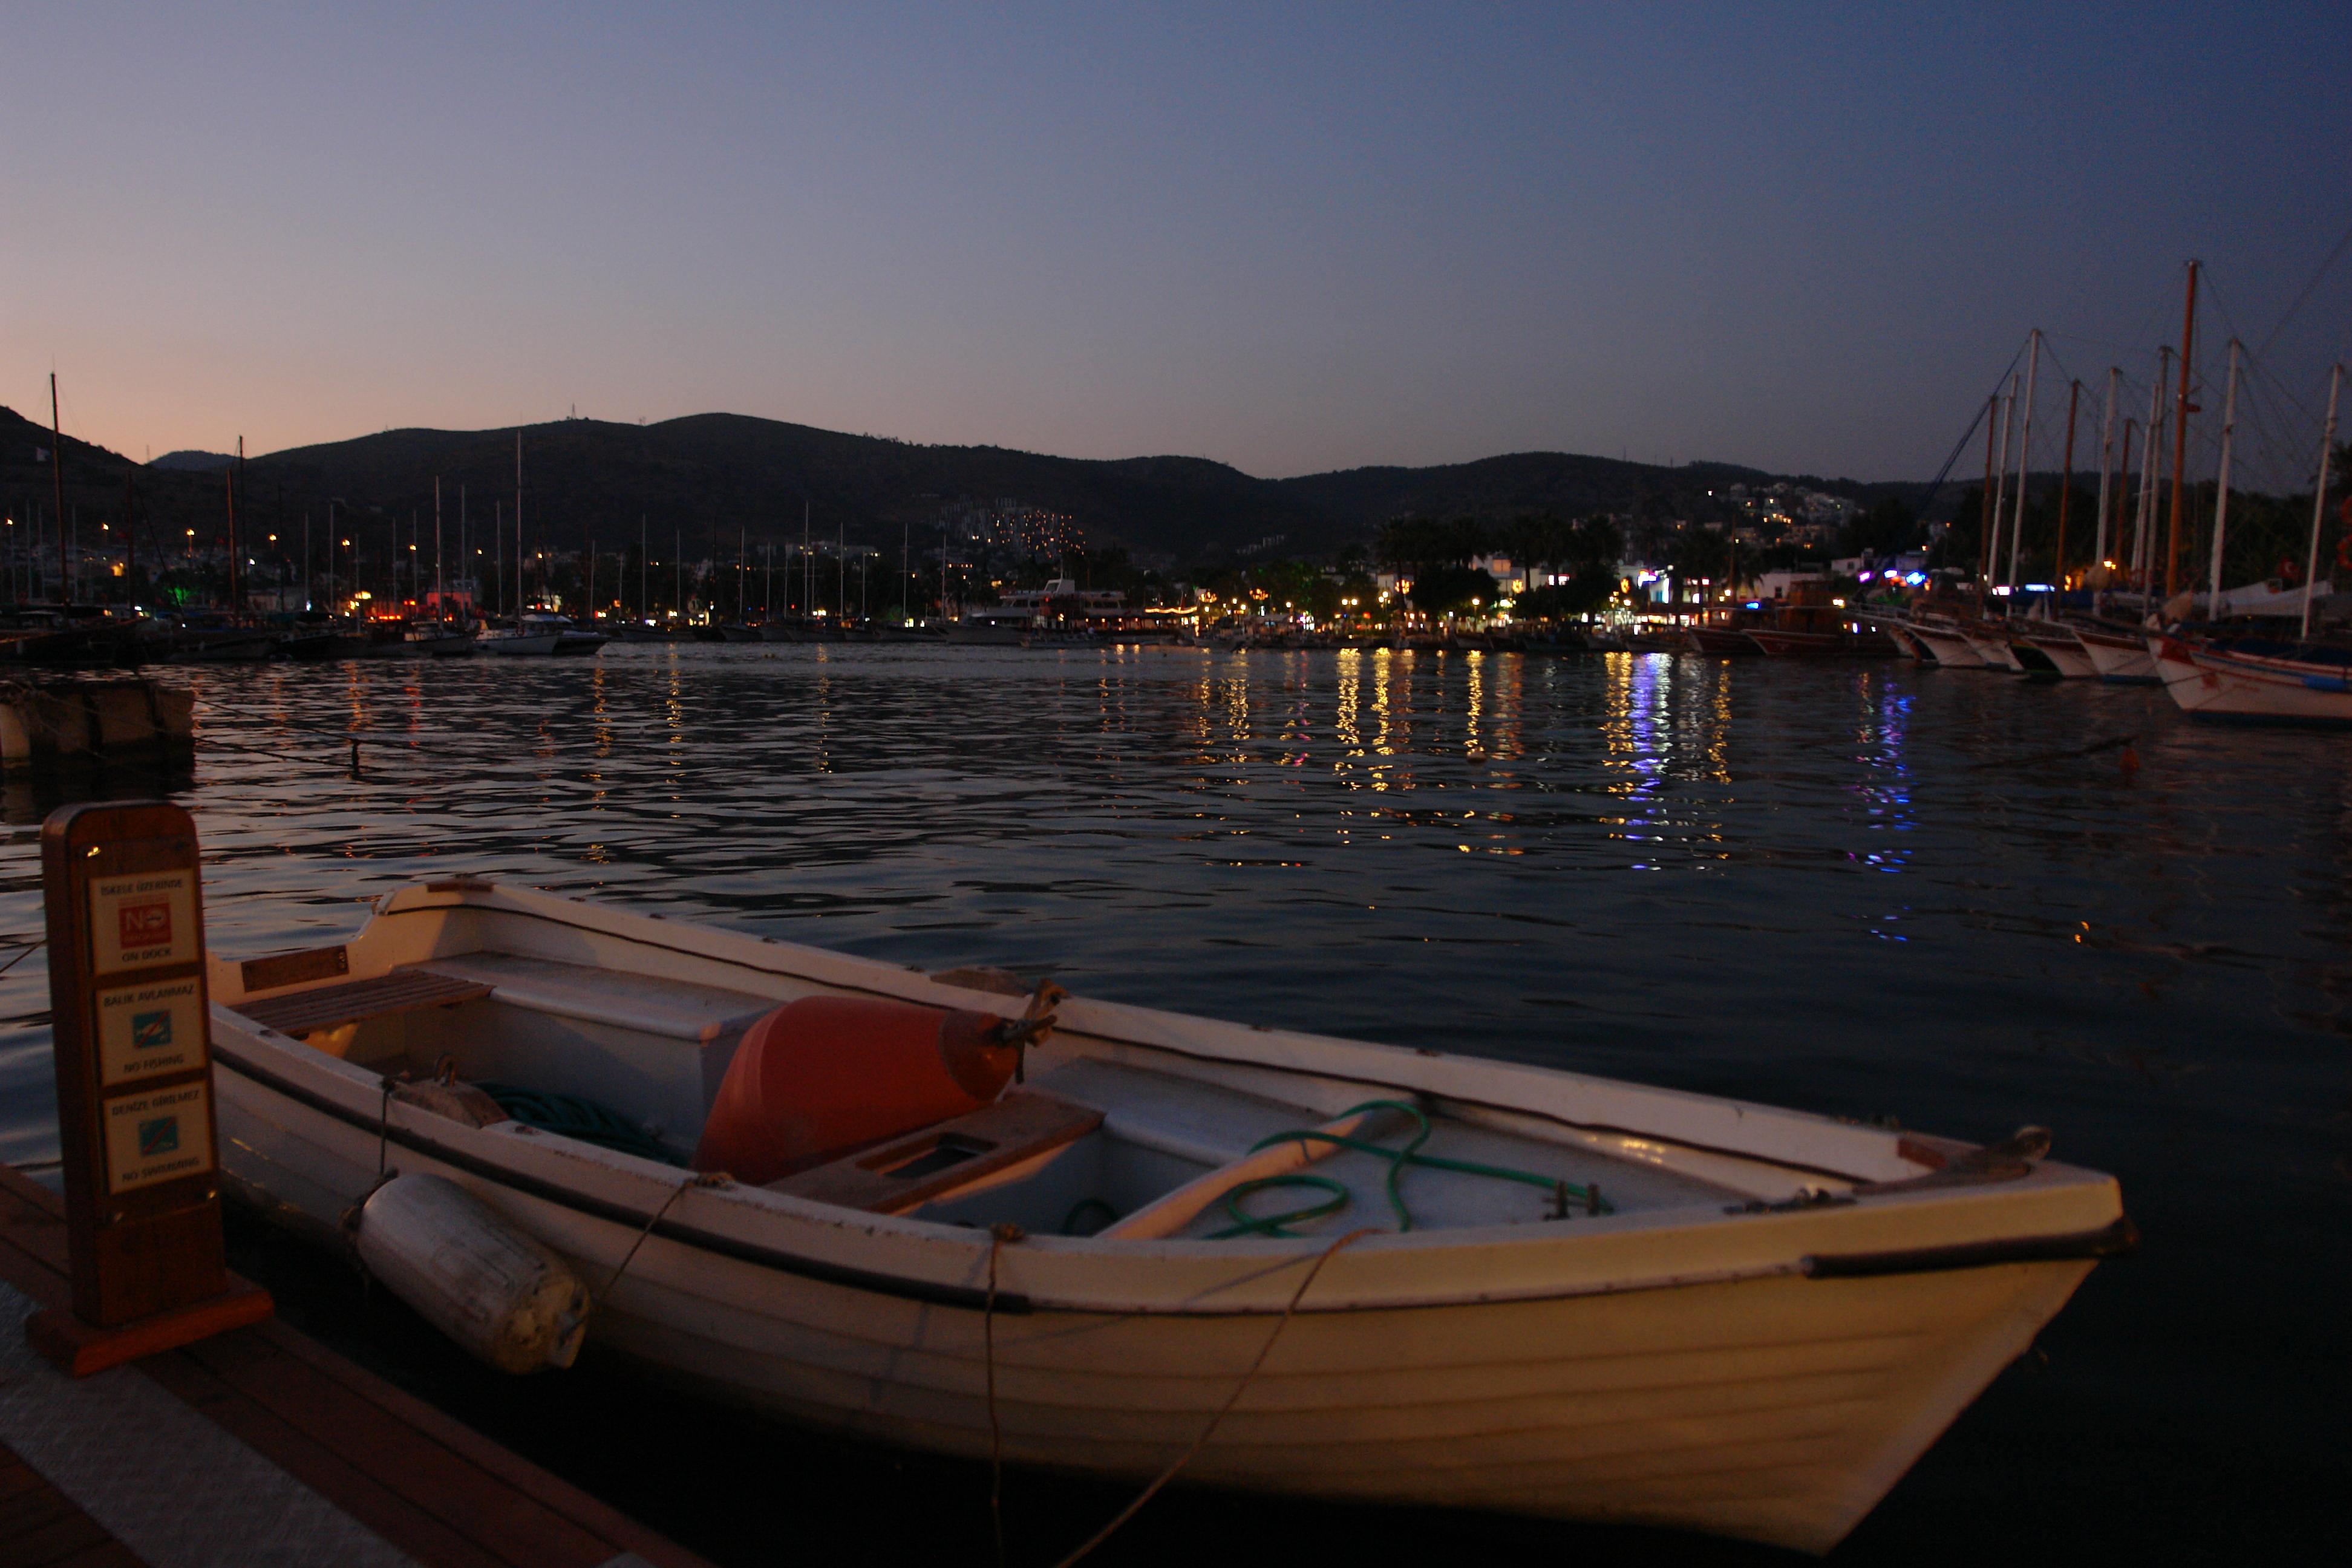 The harbor at night photo